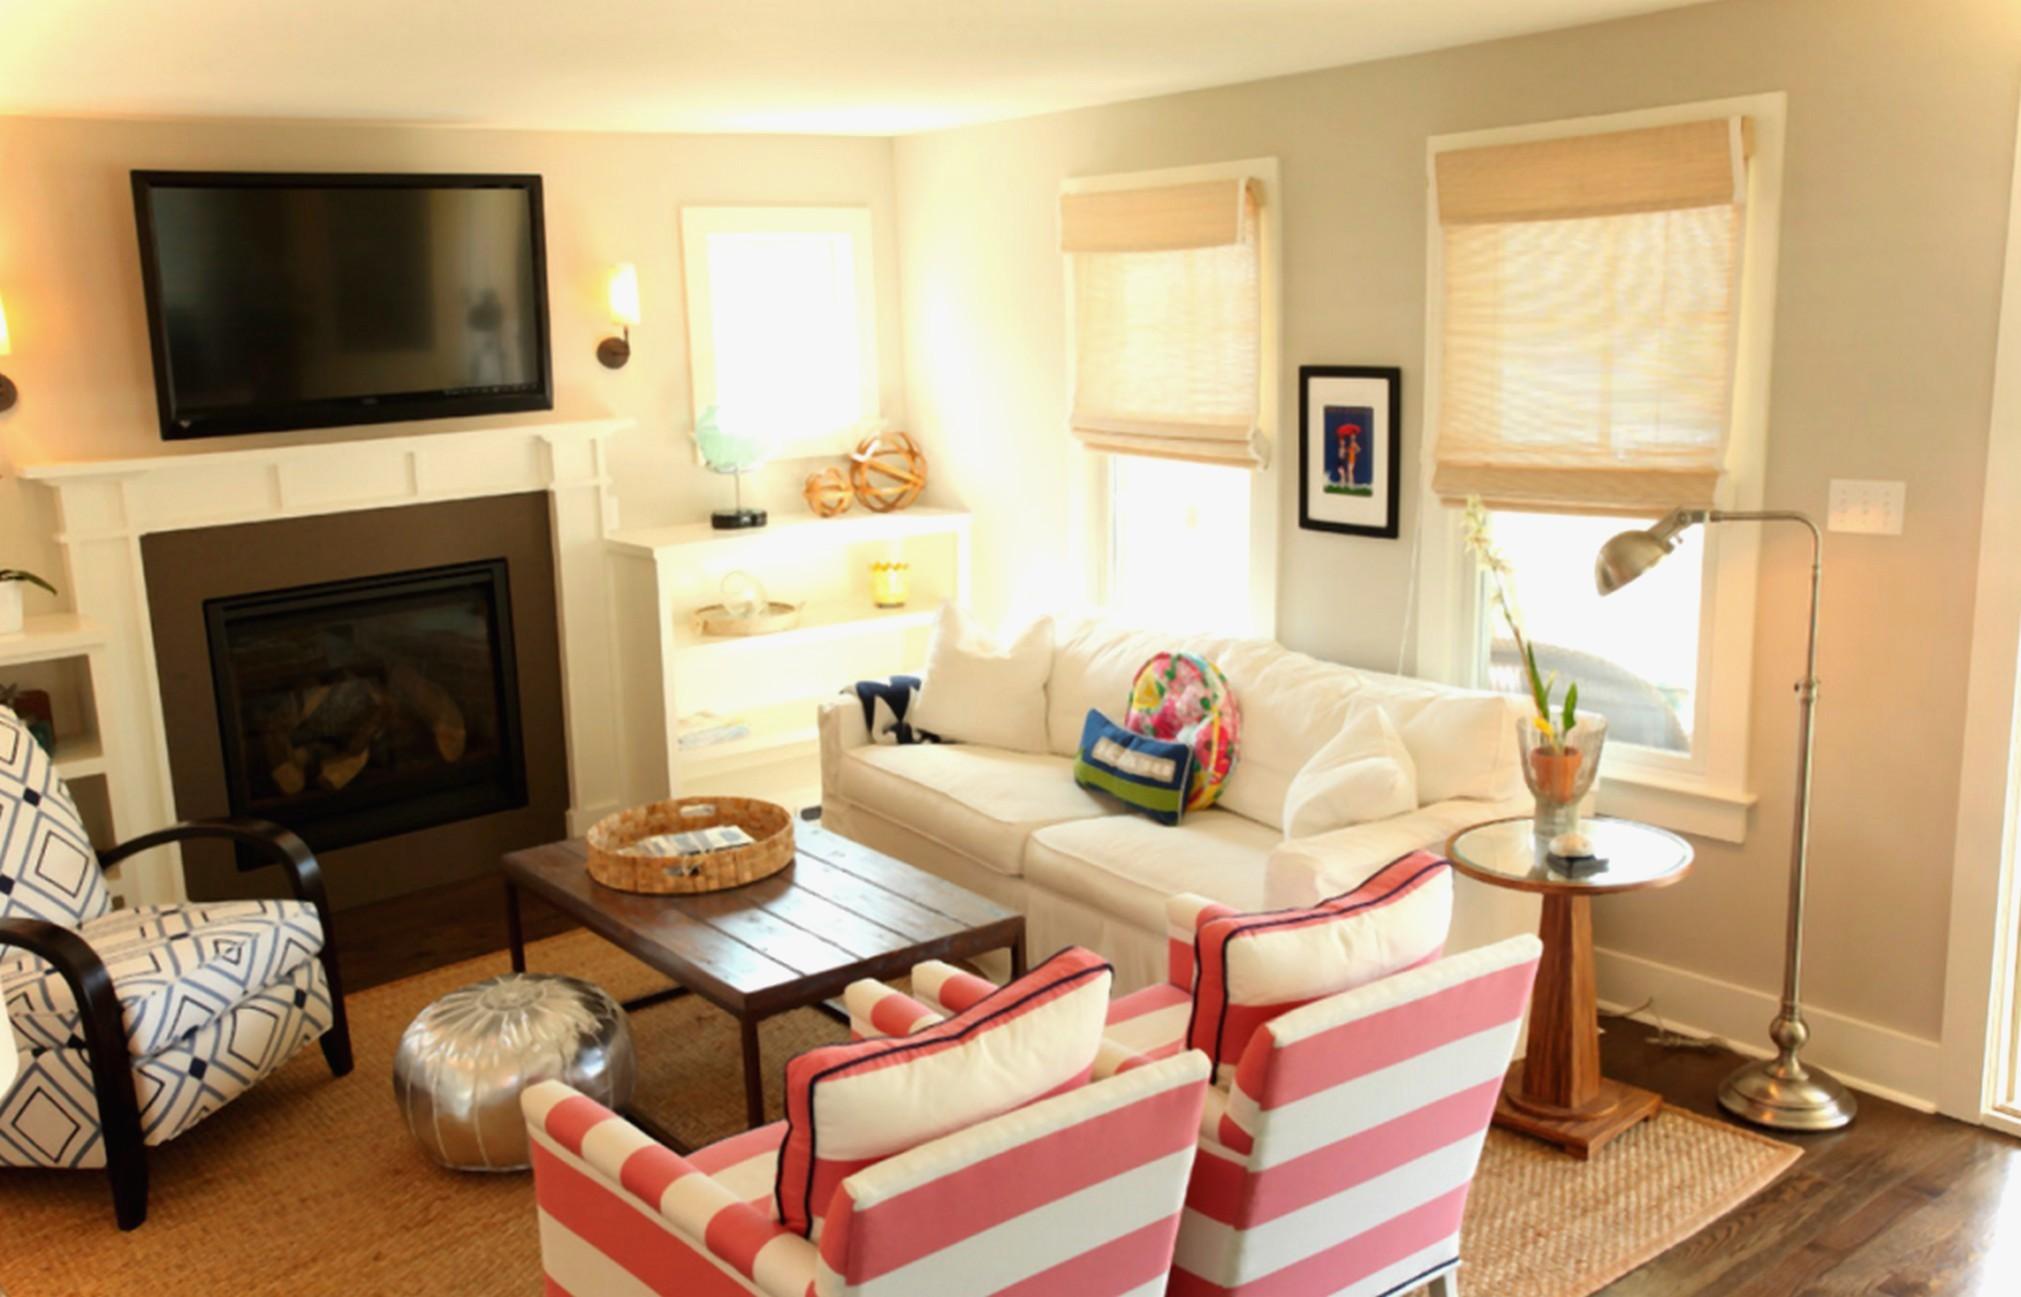 small living room layout with fireplace sheer curtains for amazing furniture arrangemen 13603 acnn decor arrangement of wonderful arrange around save fresh 22